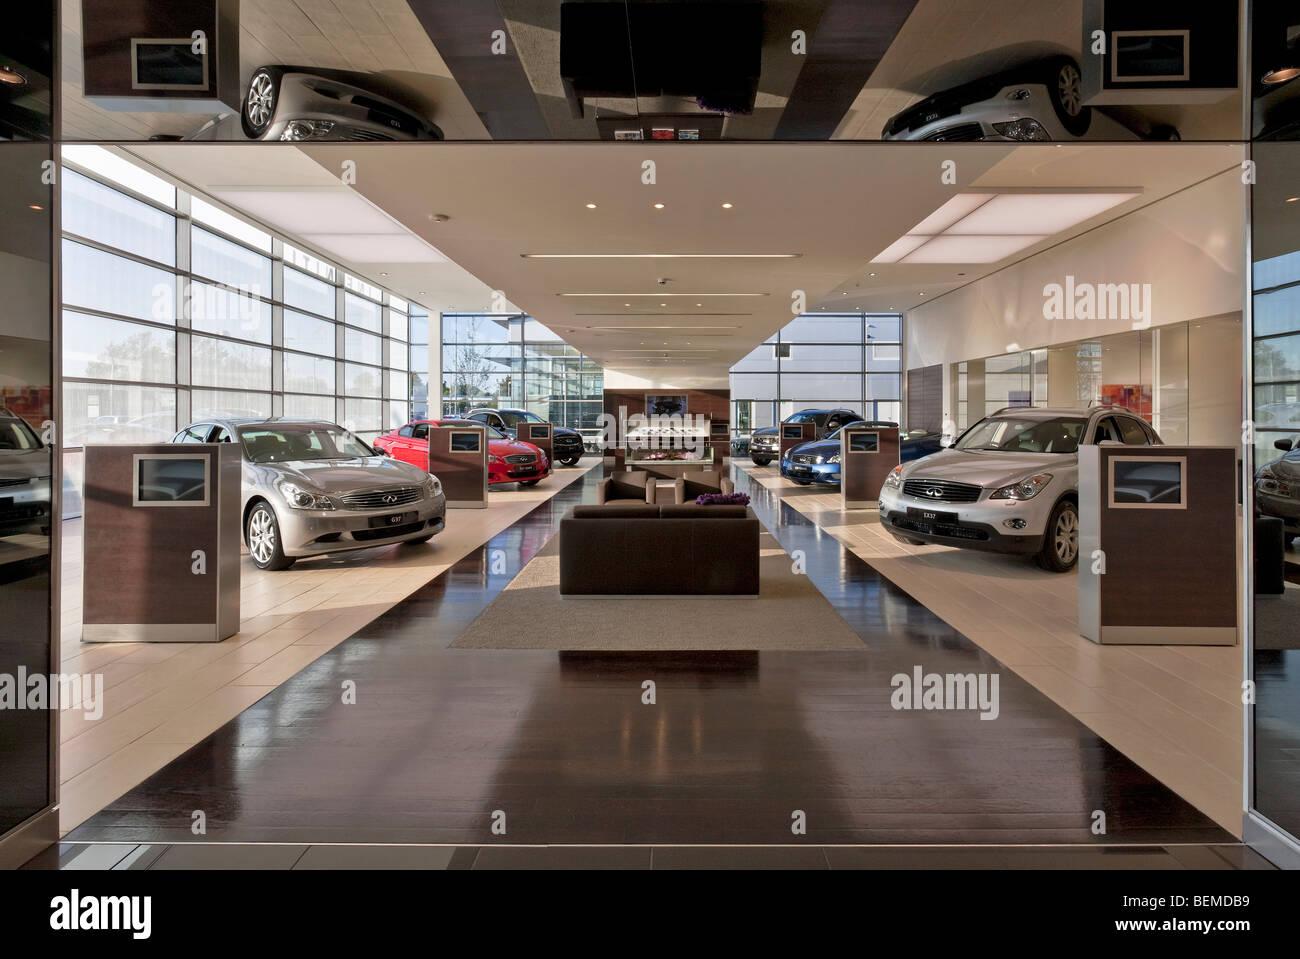 Infiniti Dealer Reading >> Infiniti Car Showroom In Reading Stock Photo 26265101 Alamy